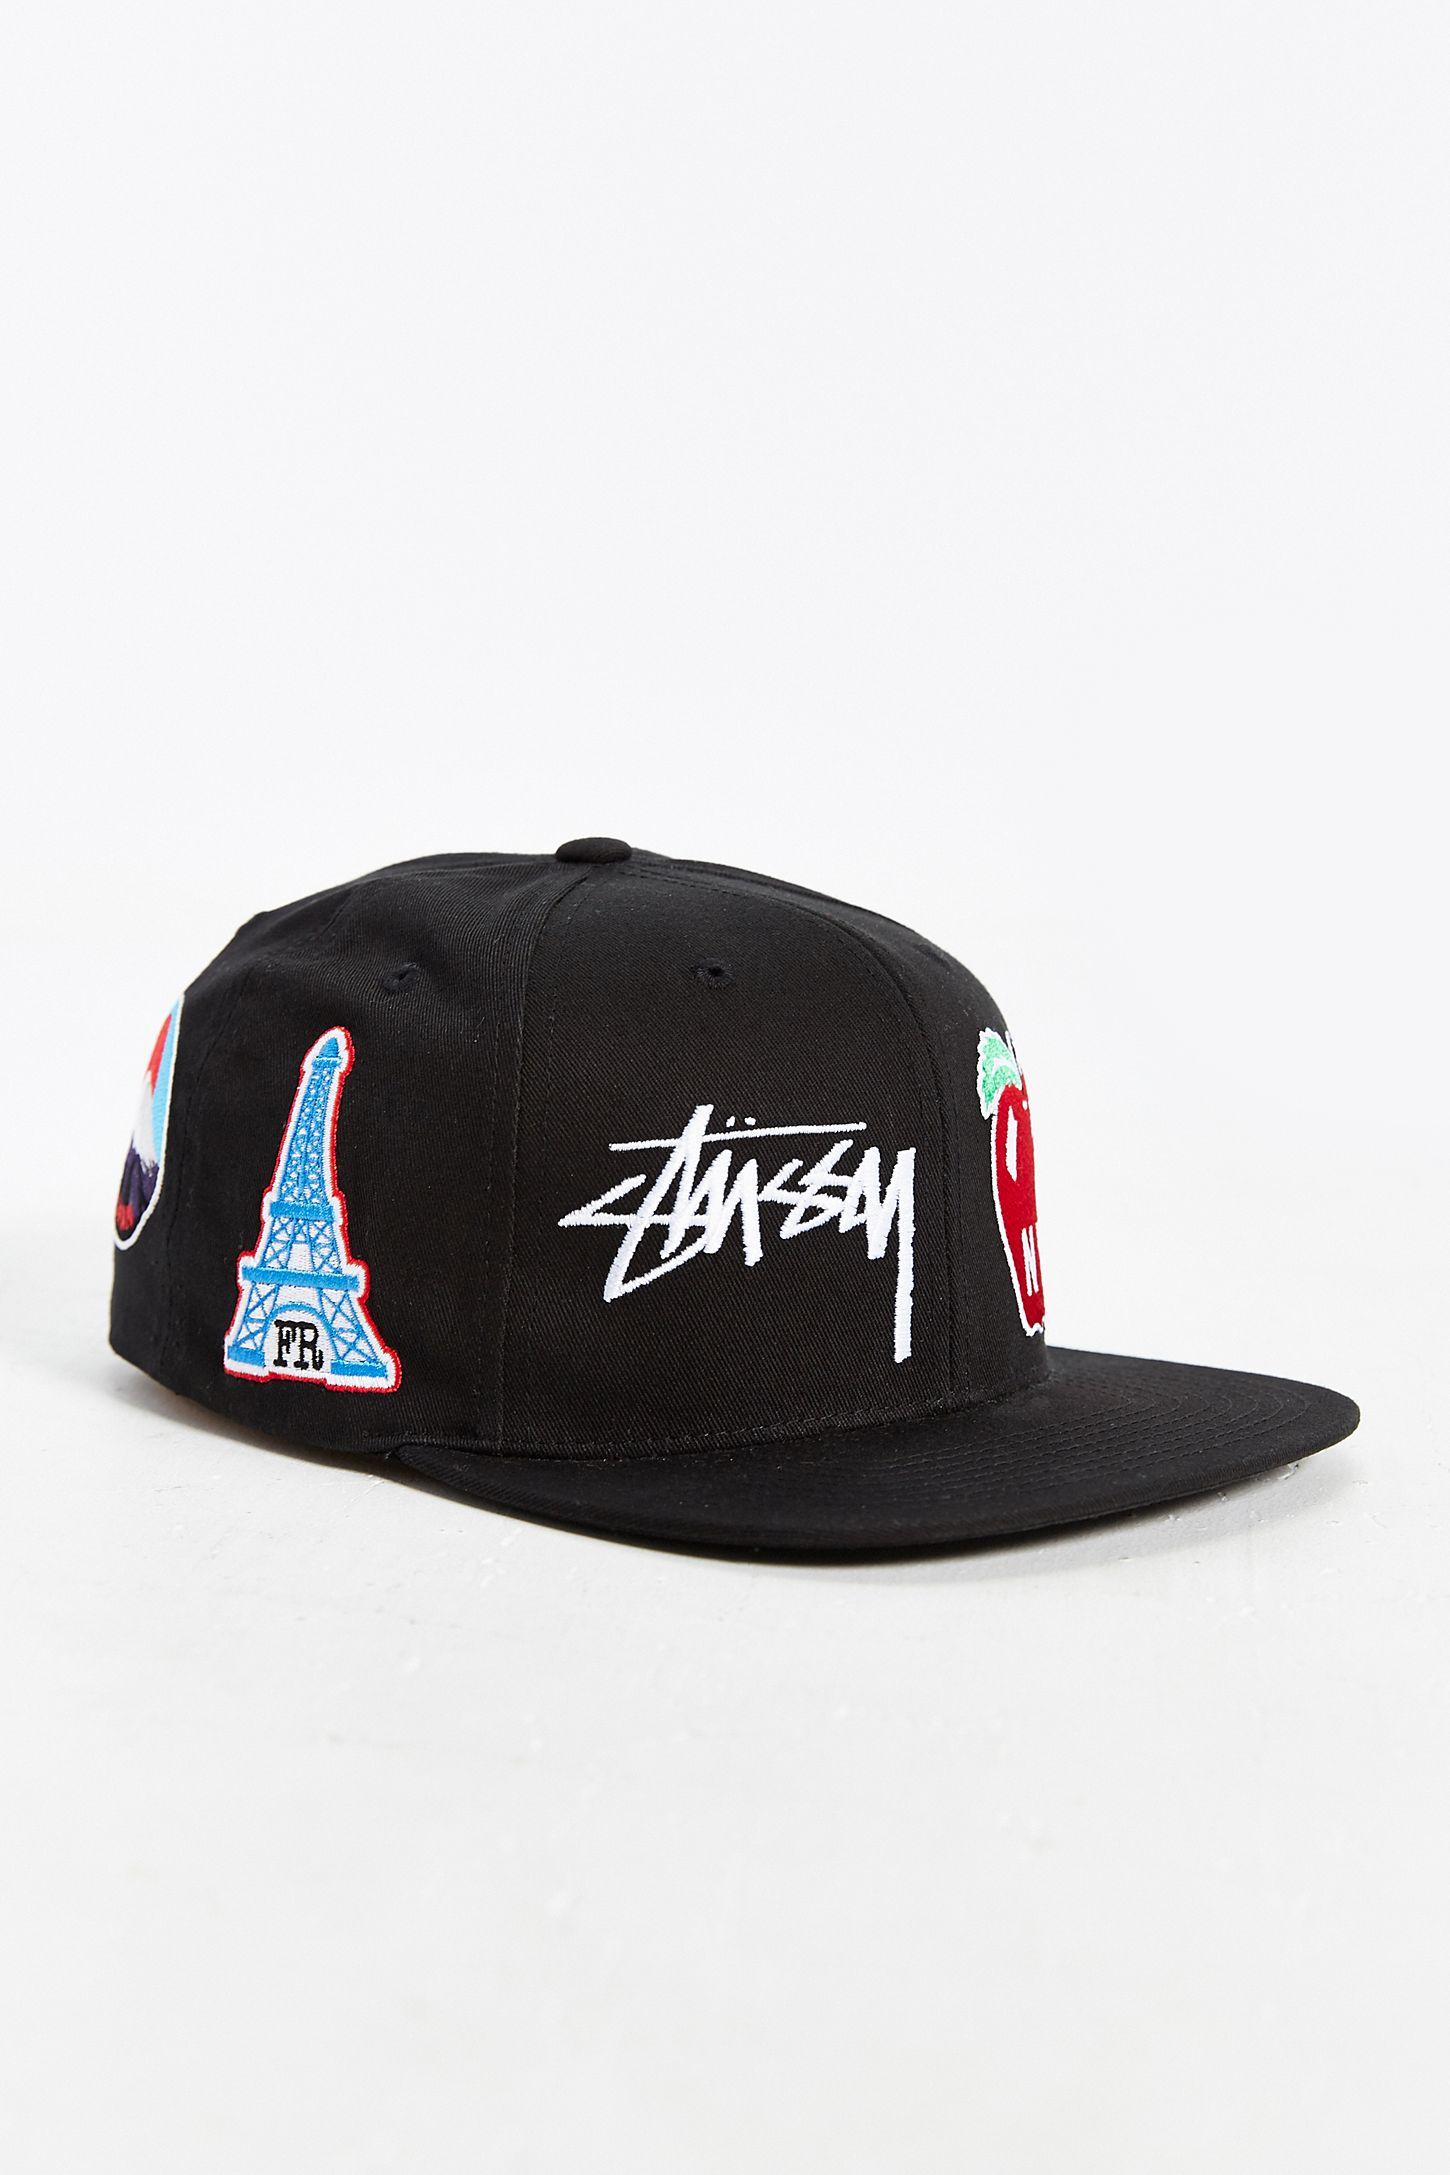 61c512df620 Stussy World Tour Icons Snapback Hat